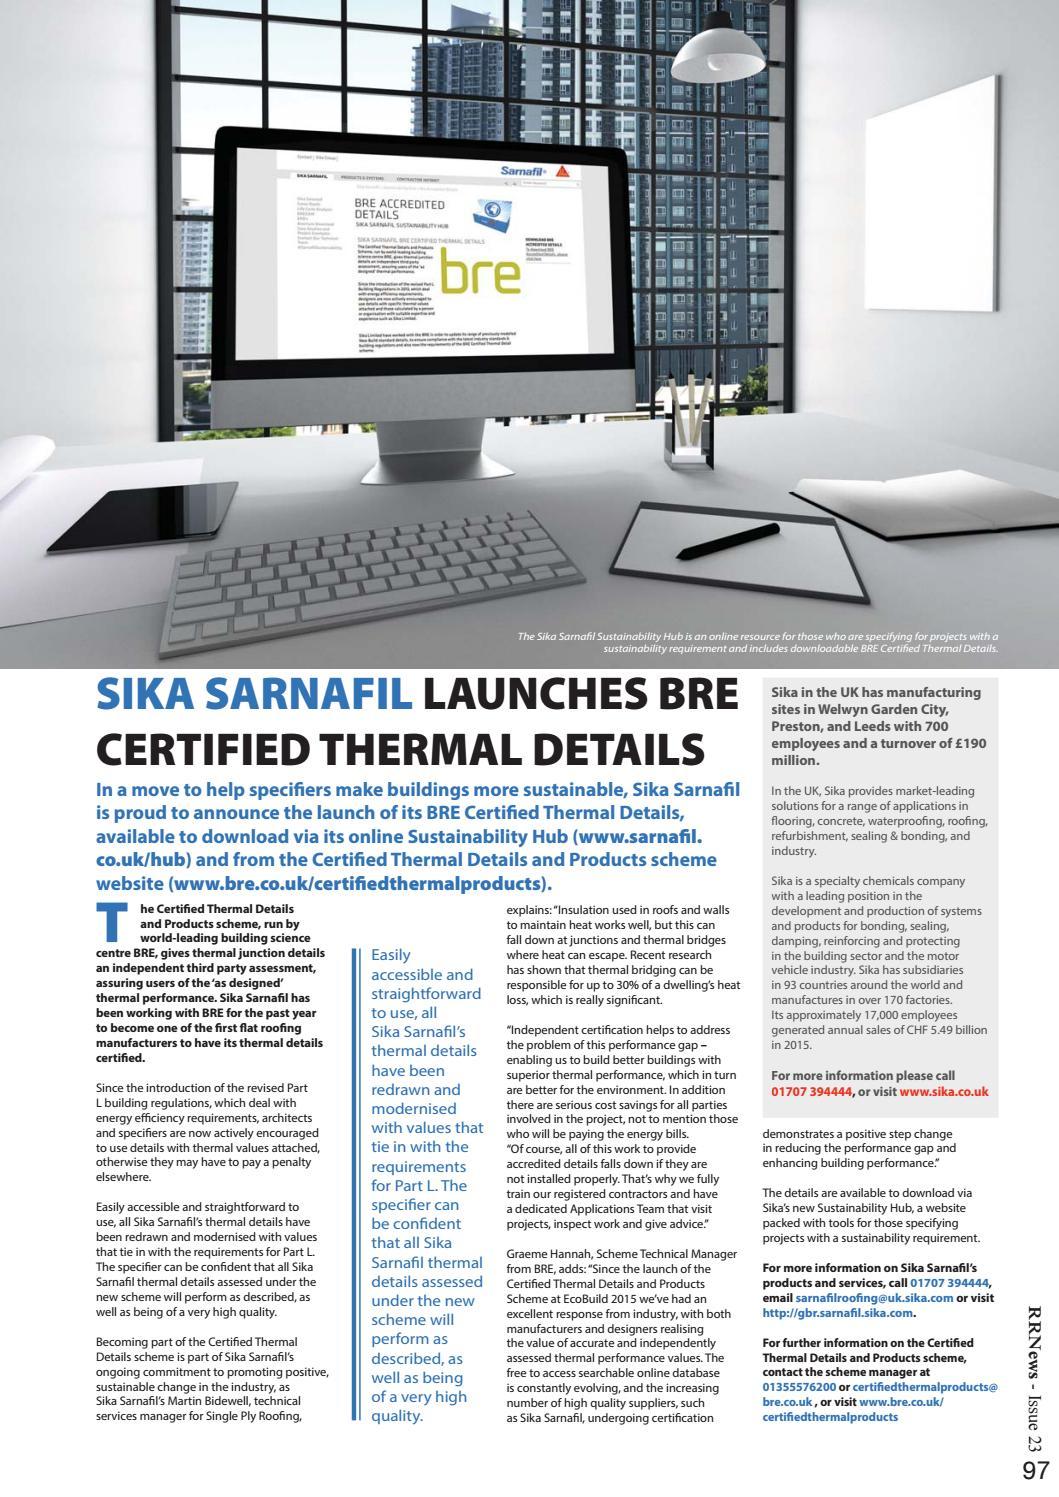 Refurb Renovation News Issue 23 by Lapthorn Media - issuu